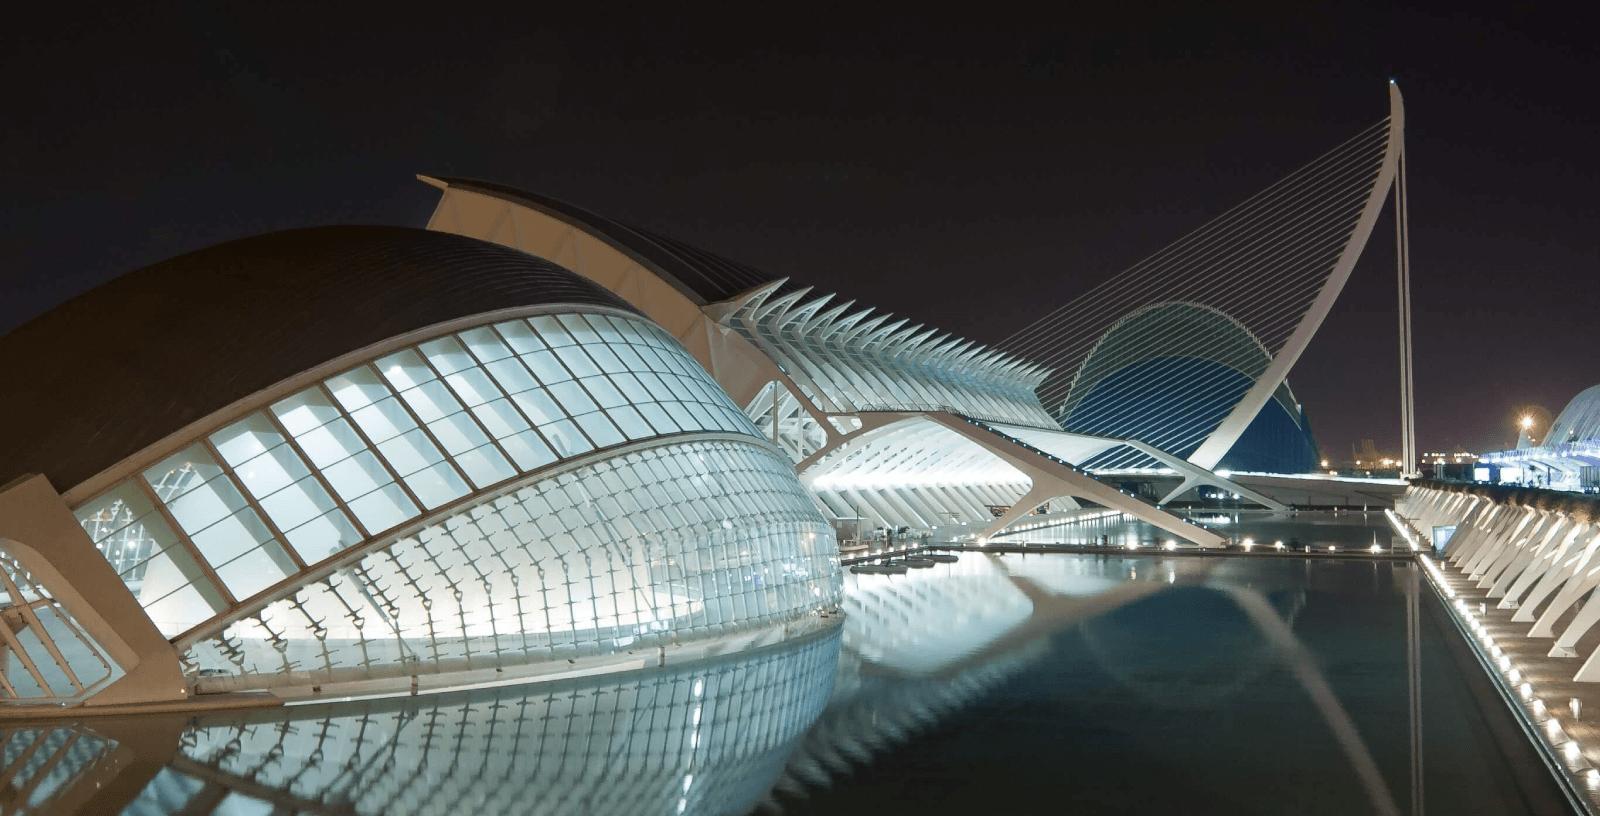 Valencia_1291643_Somo_Photography_Pixabay License_IDOM_Consultoria